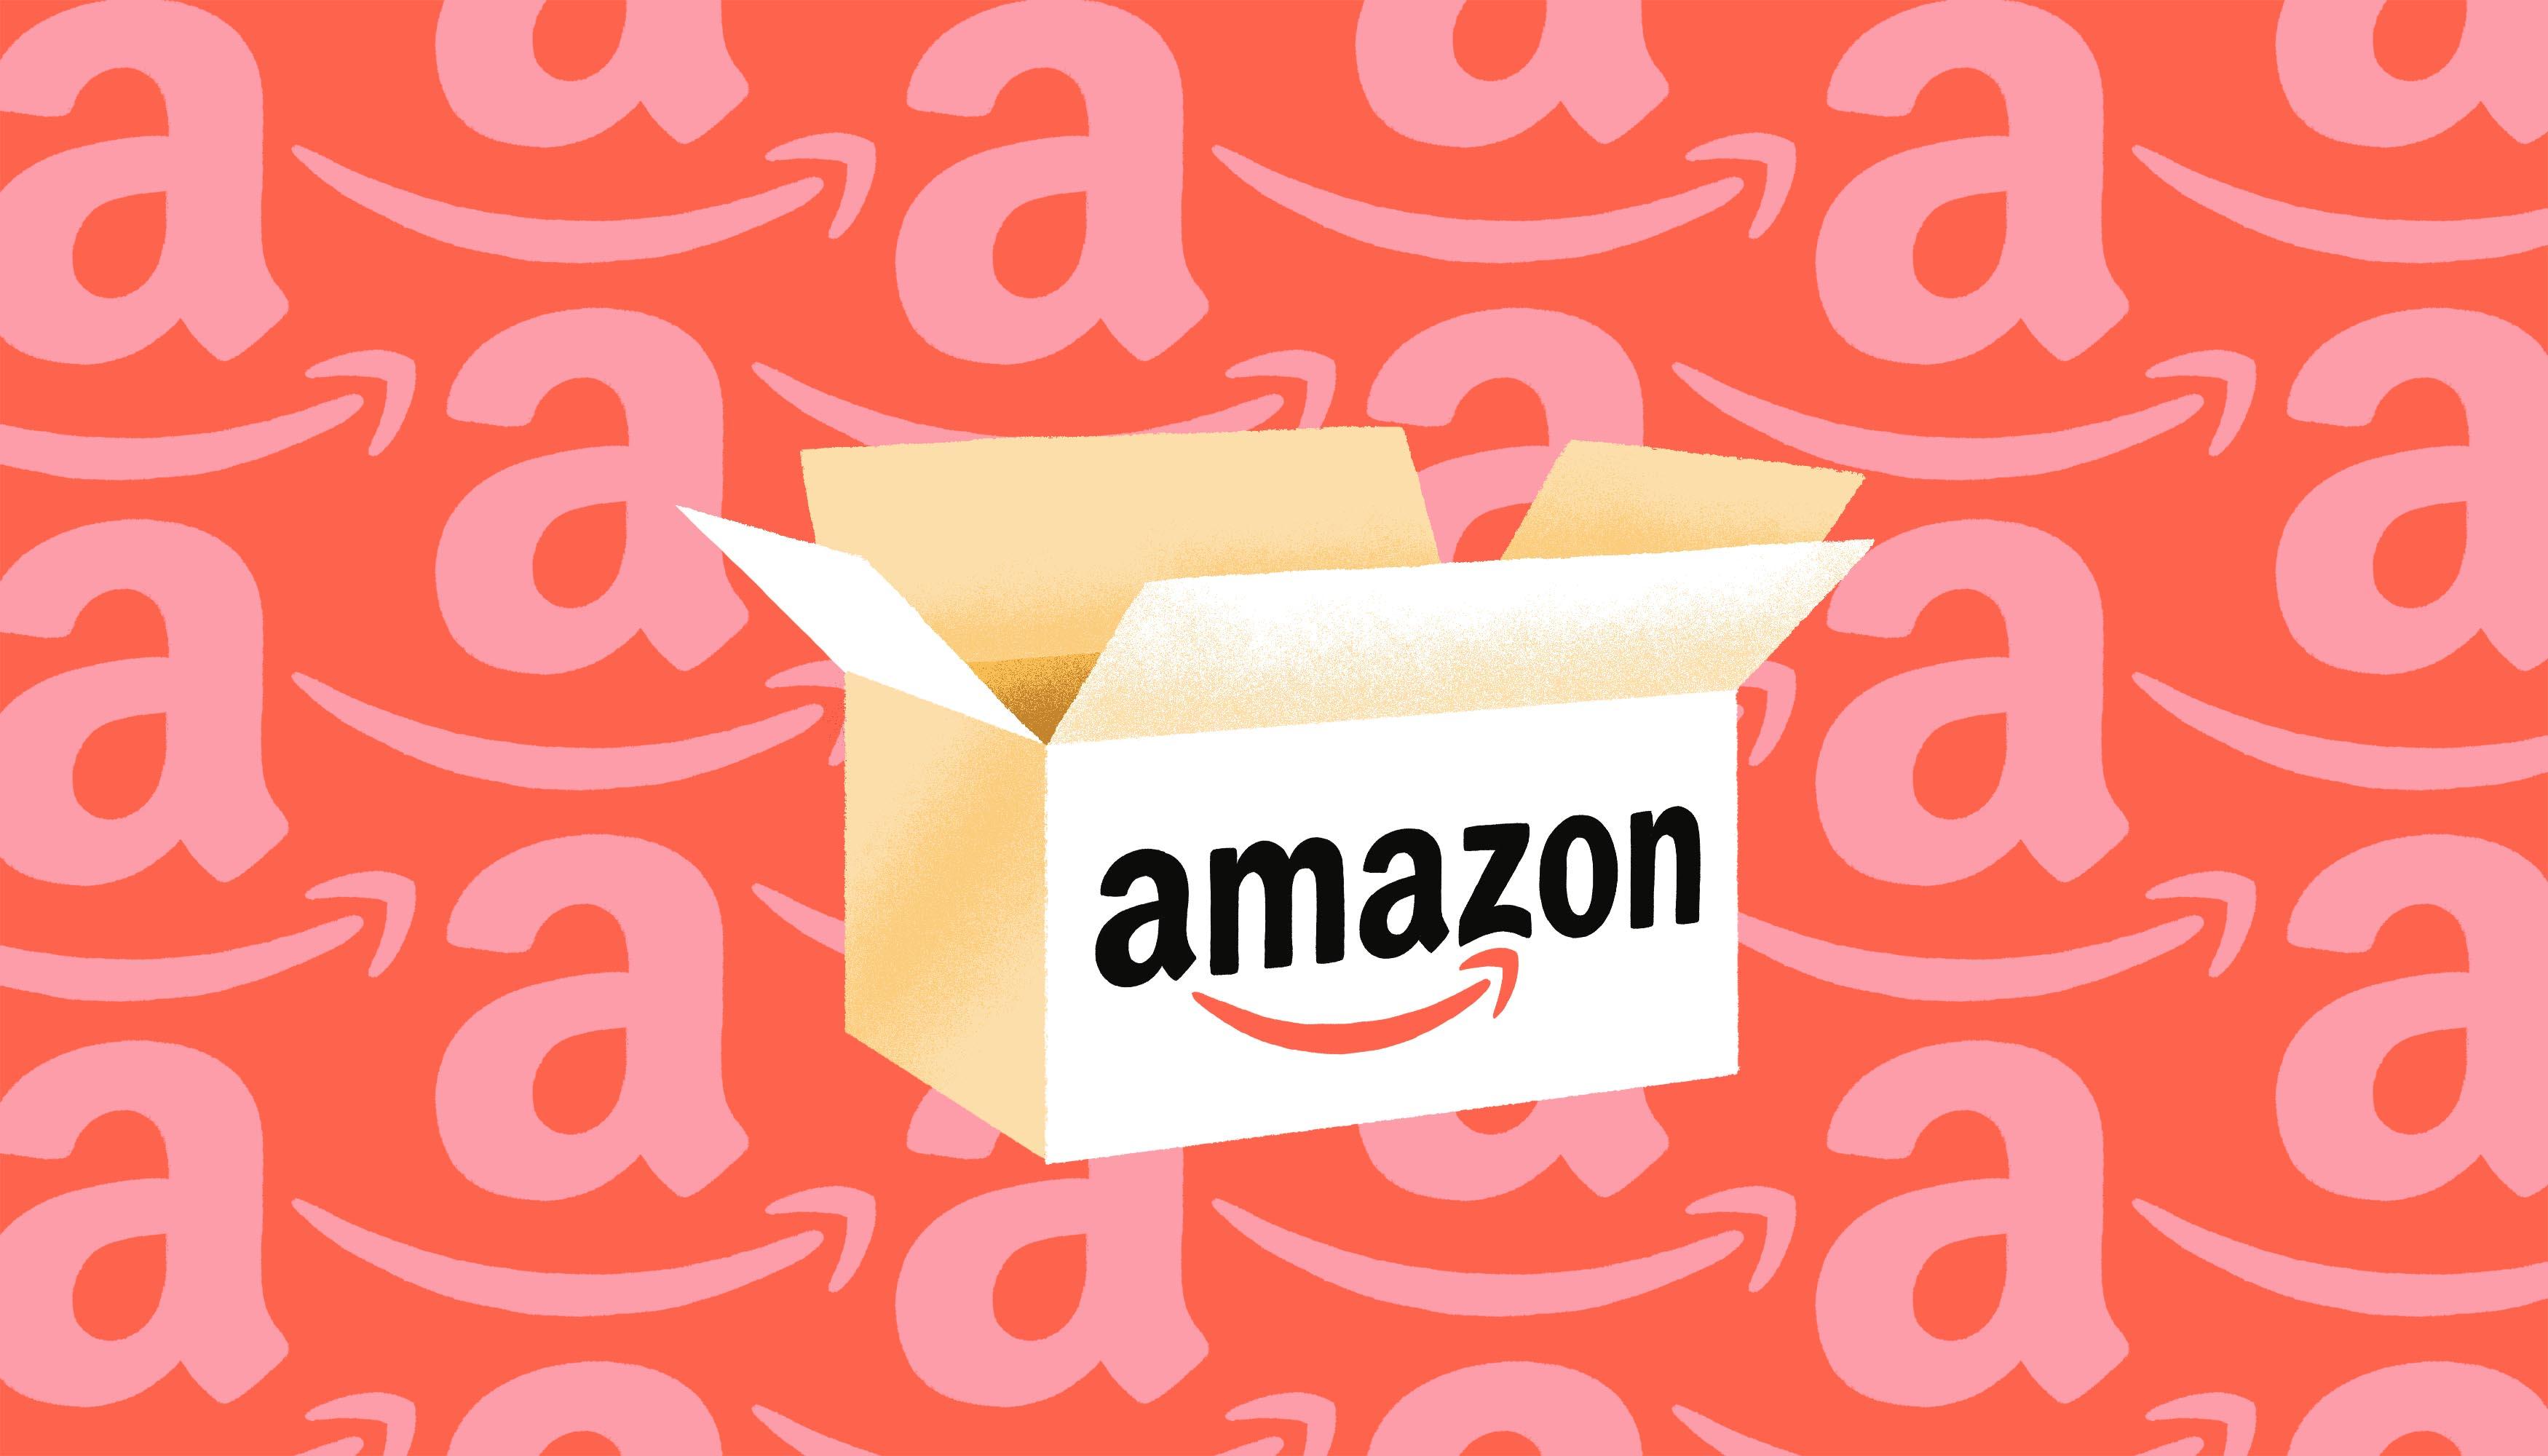 Amazon HQ2 community meeting planned in Arlington